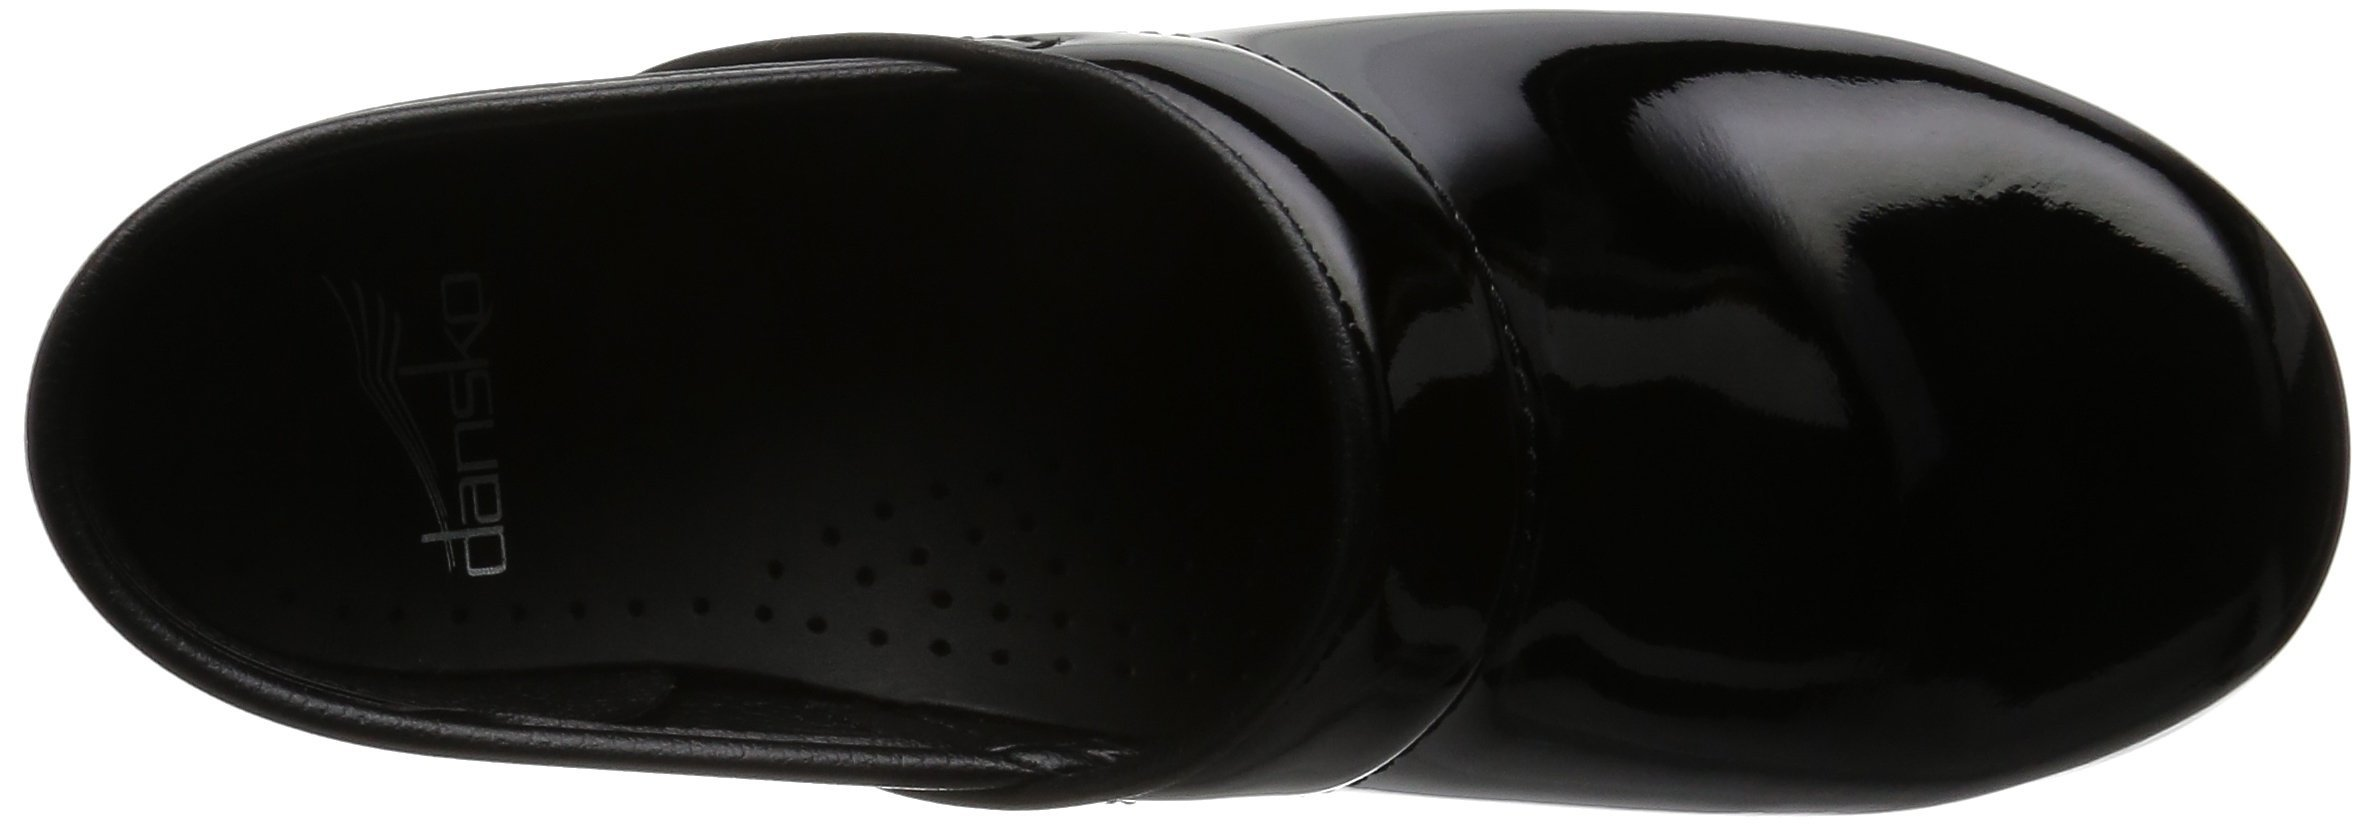 Dansko Women's Professional Patent Leather Clog,Black Patent,37 EU / 6.5-7 B(M) US by Dansko (Image #9)